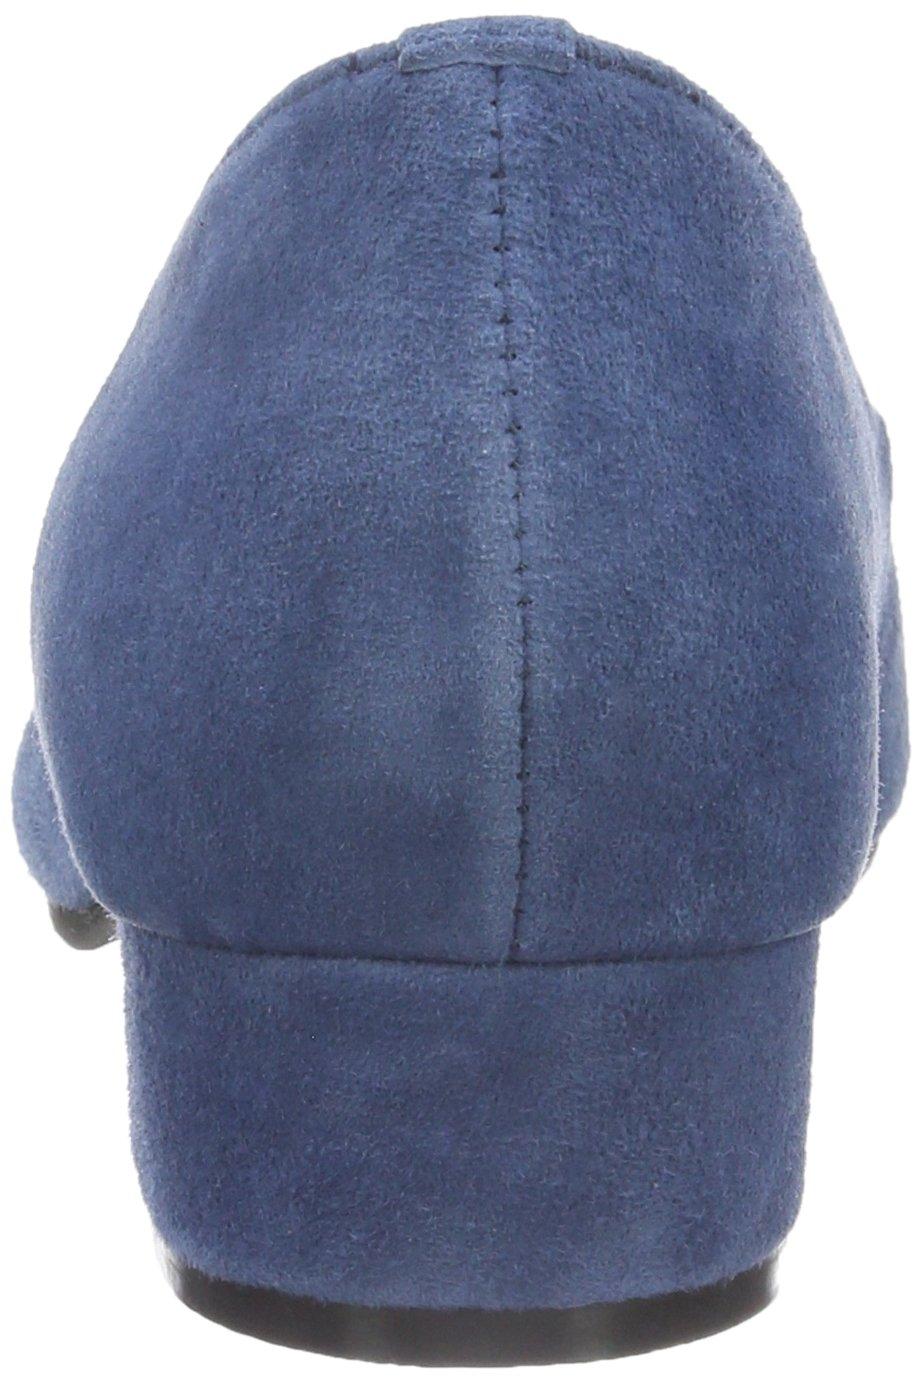 HIRSCHKOGEL Damen Pumps 3002723 Pumps Damen Blau (Jeans 274) de2d31